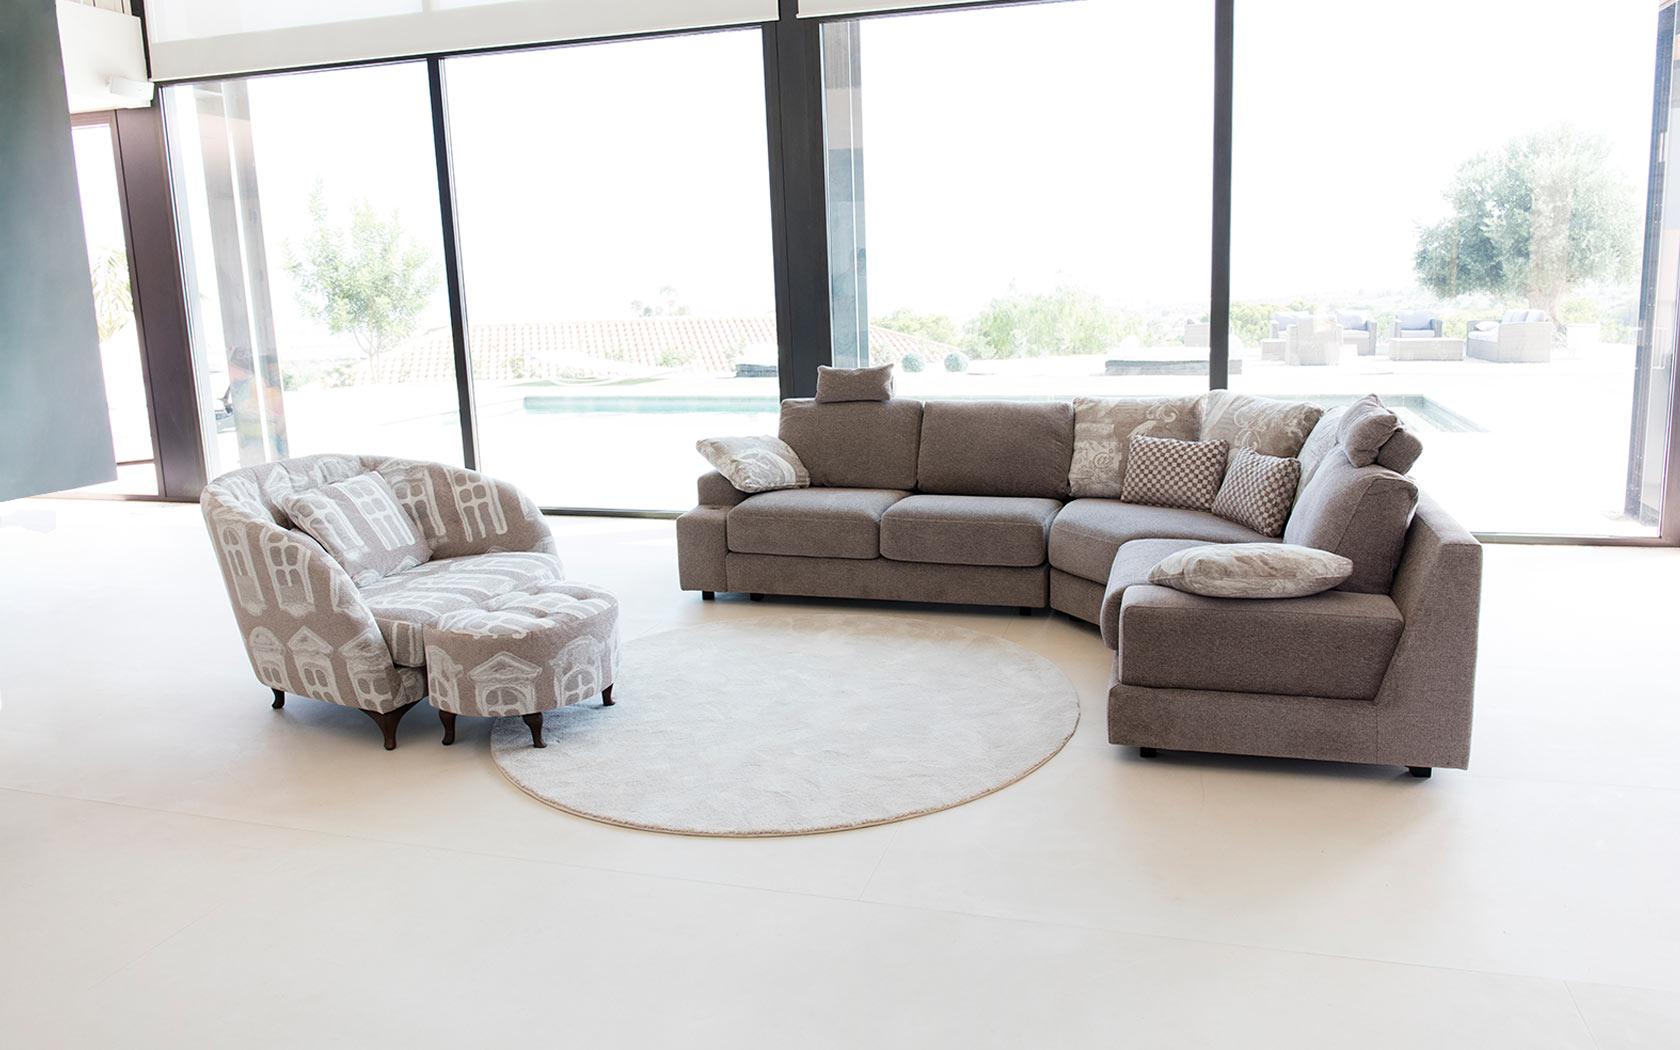 Calessi sofa Fama 2019 02